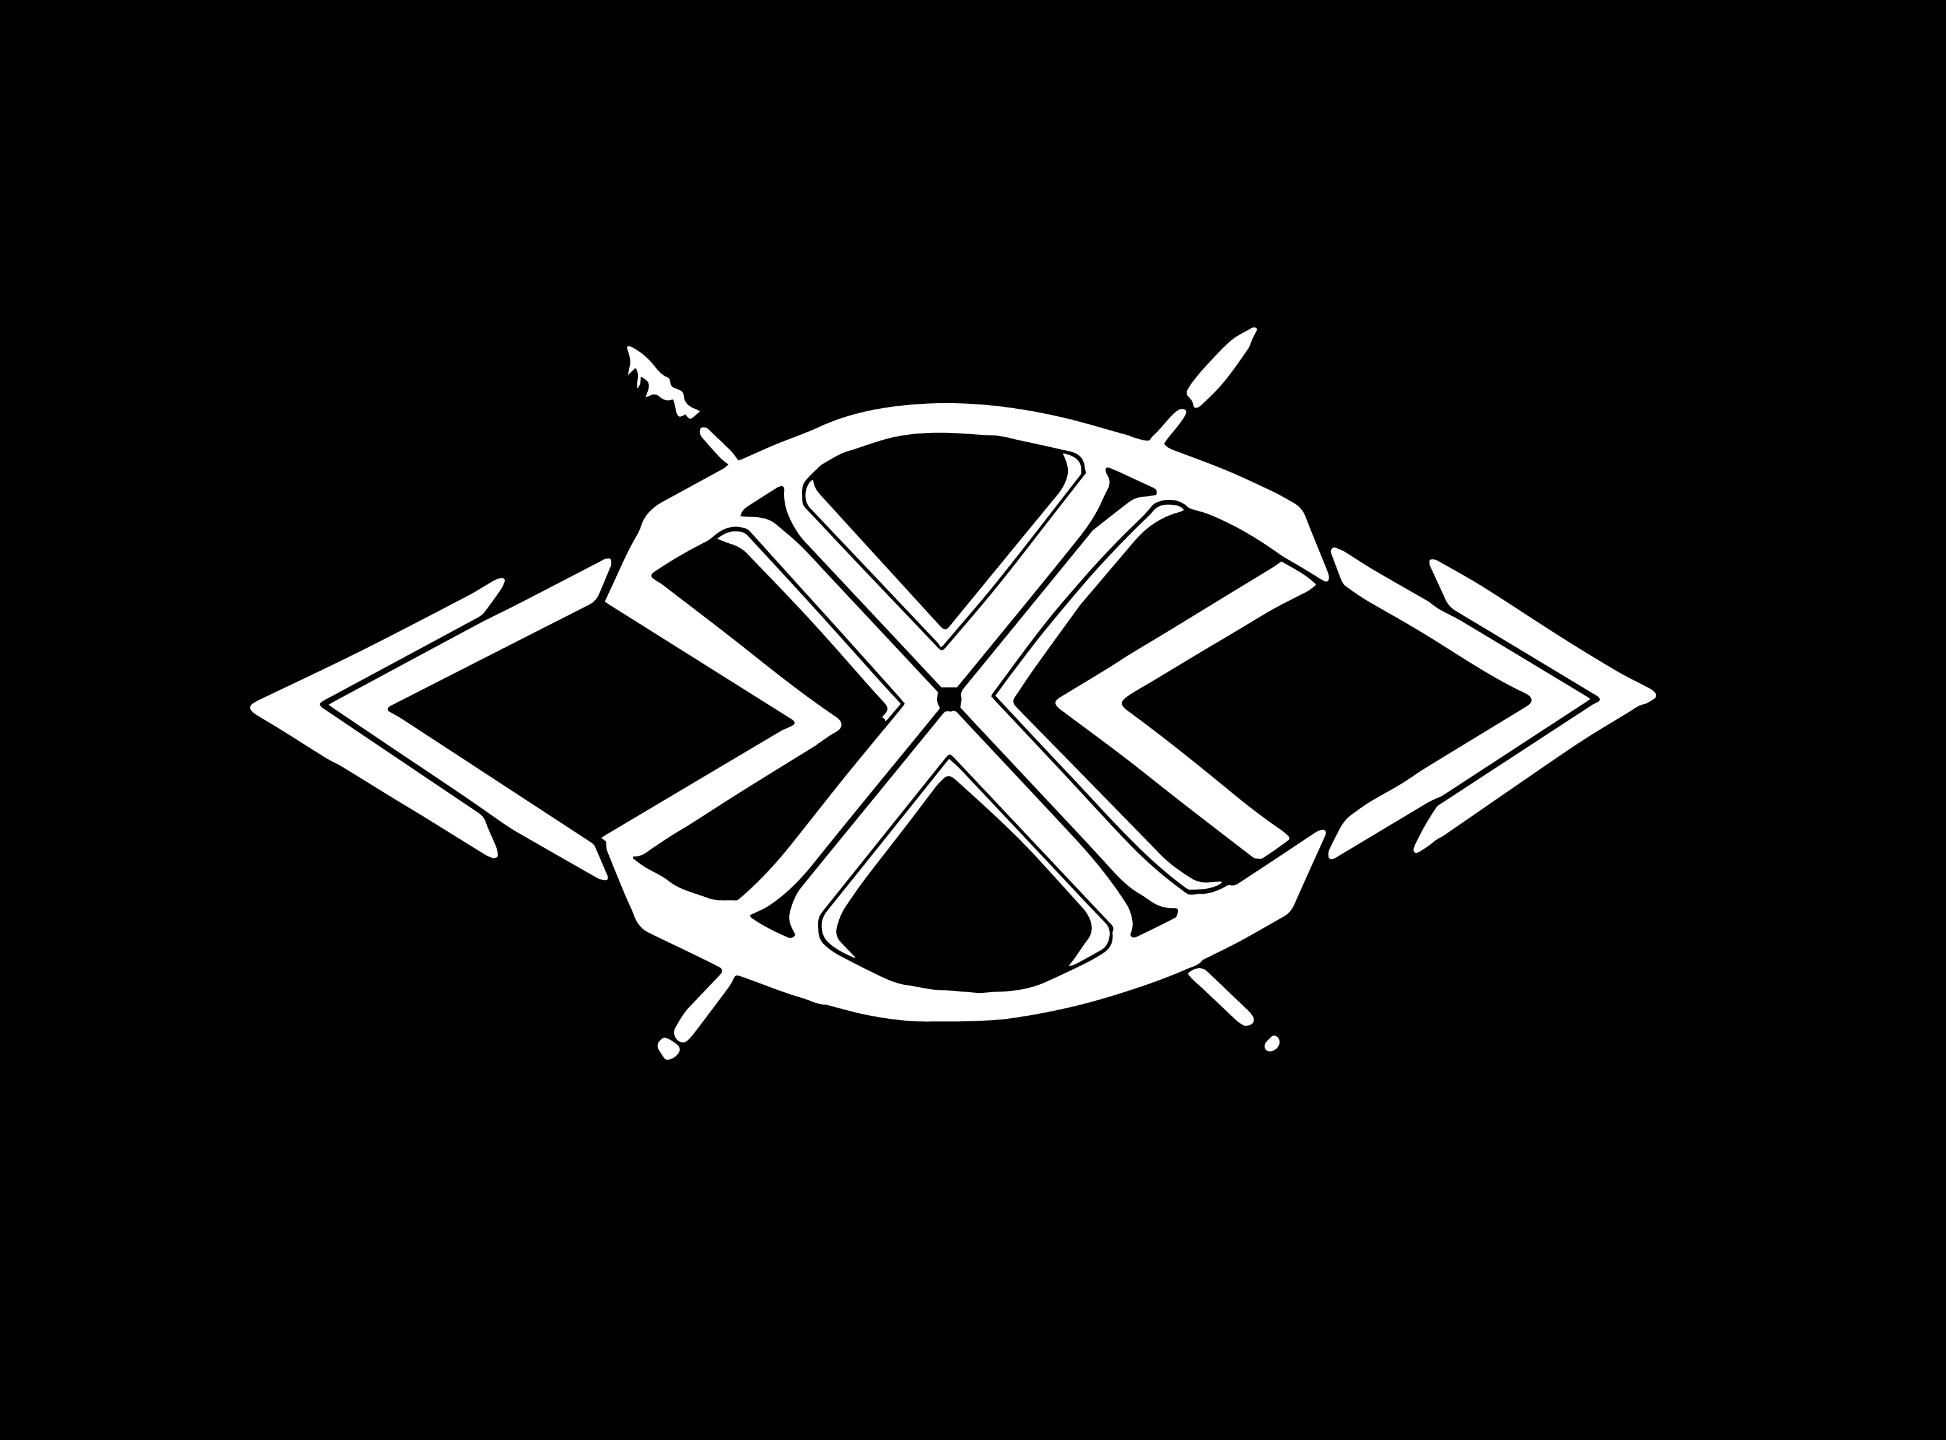 Indigenousx logo oct2014